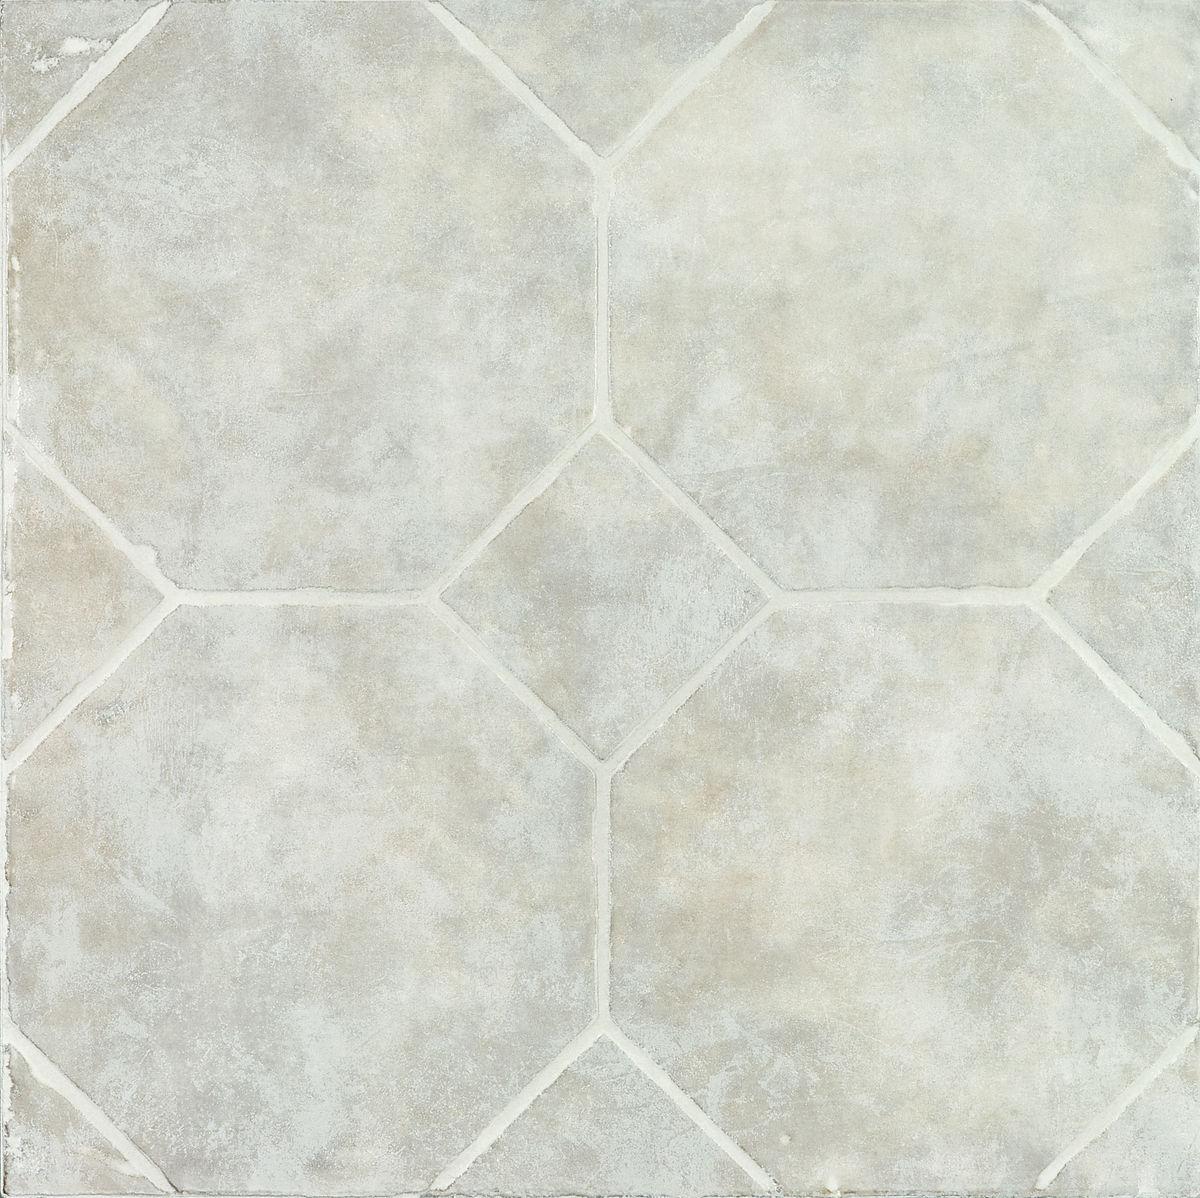 Плитка Octagon  bianco 45x45 (zwxl81) изображение 0